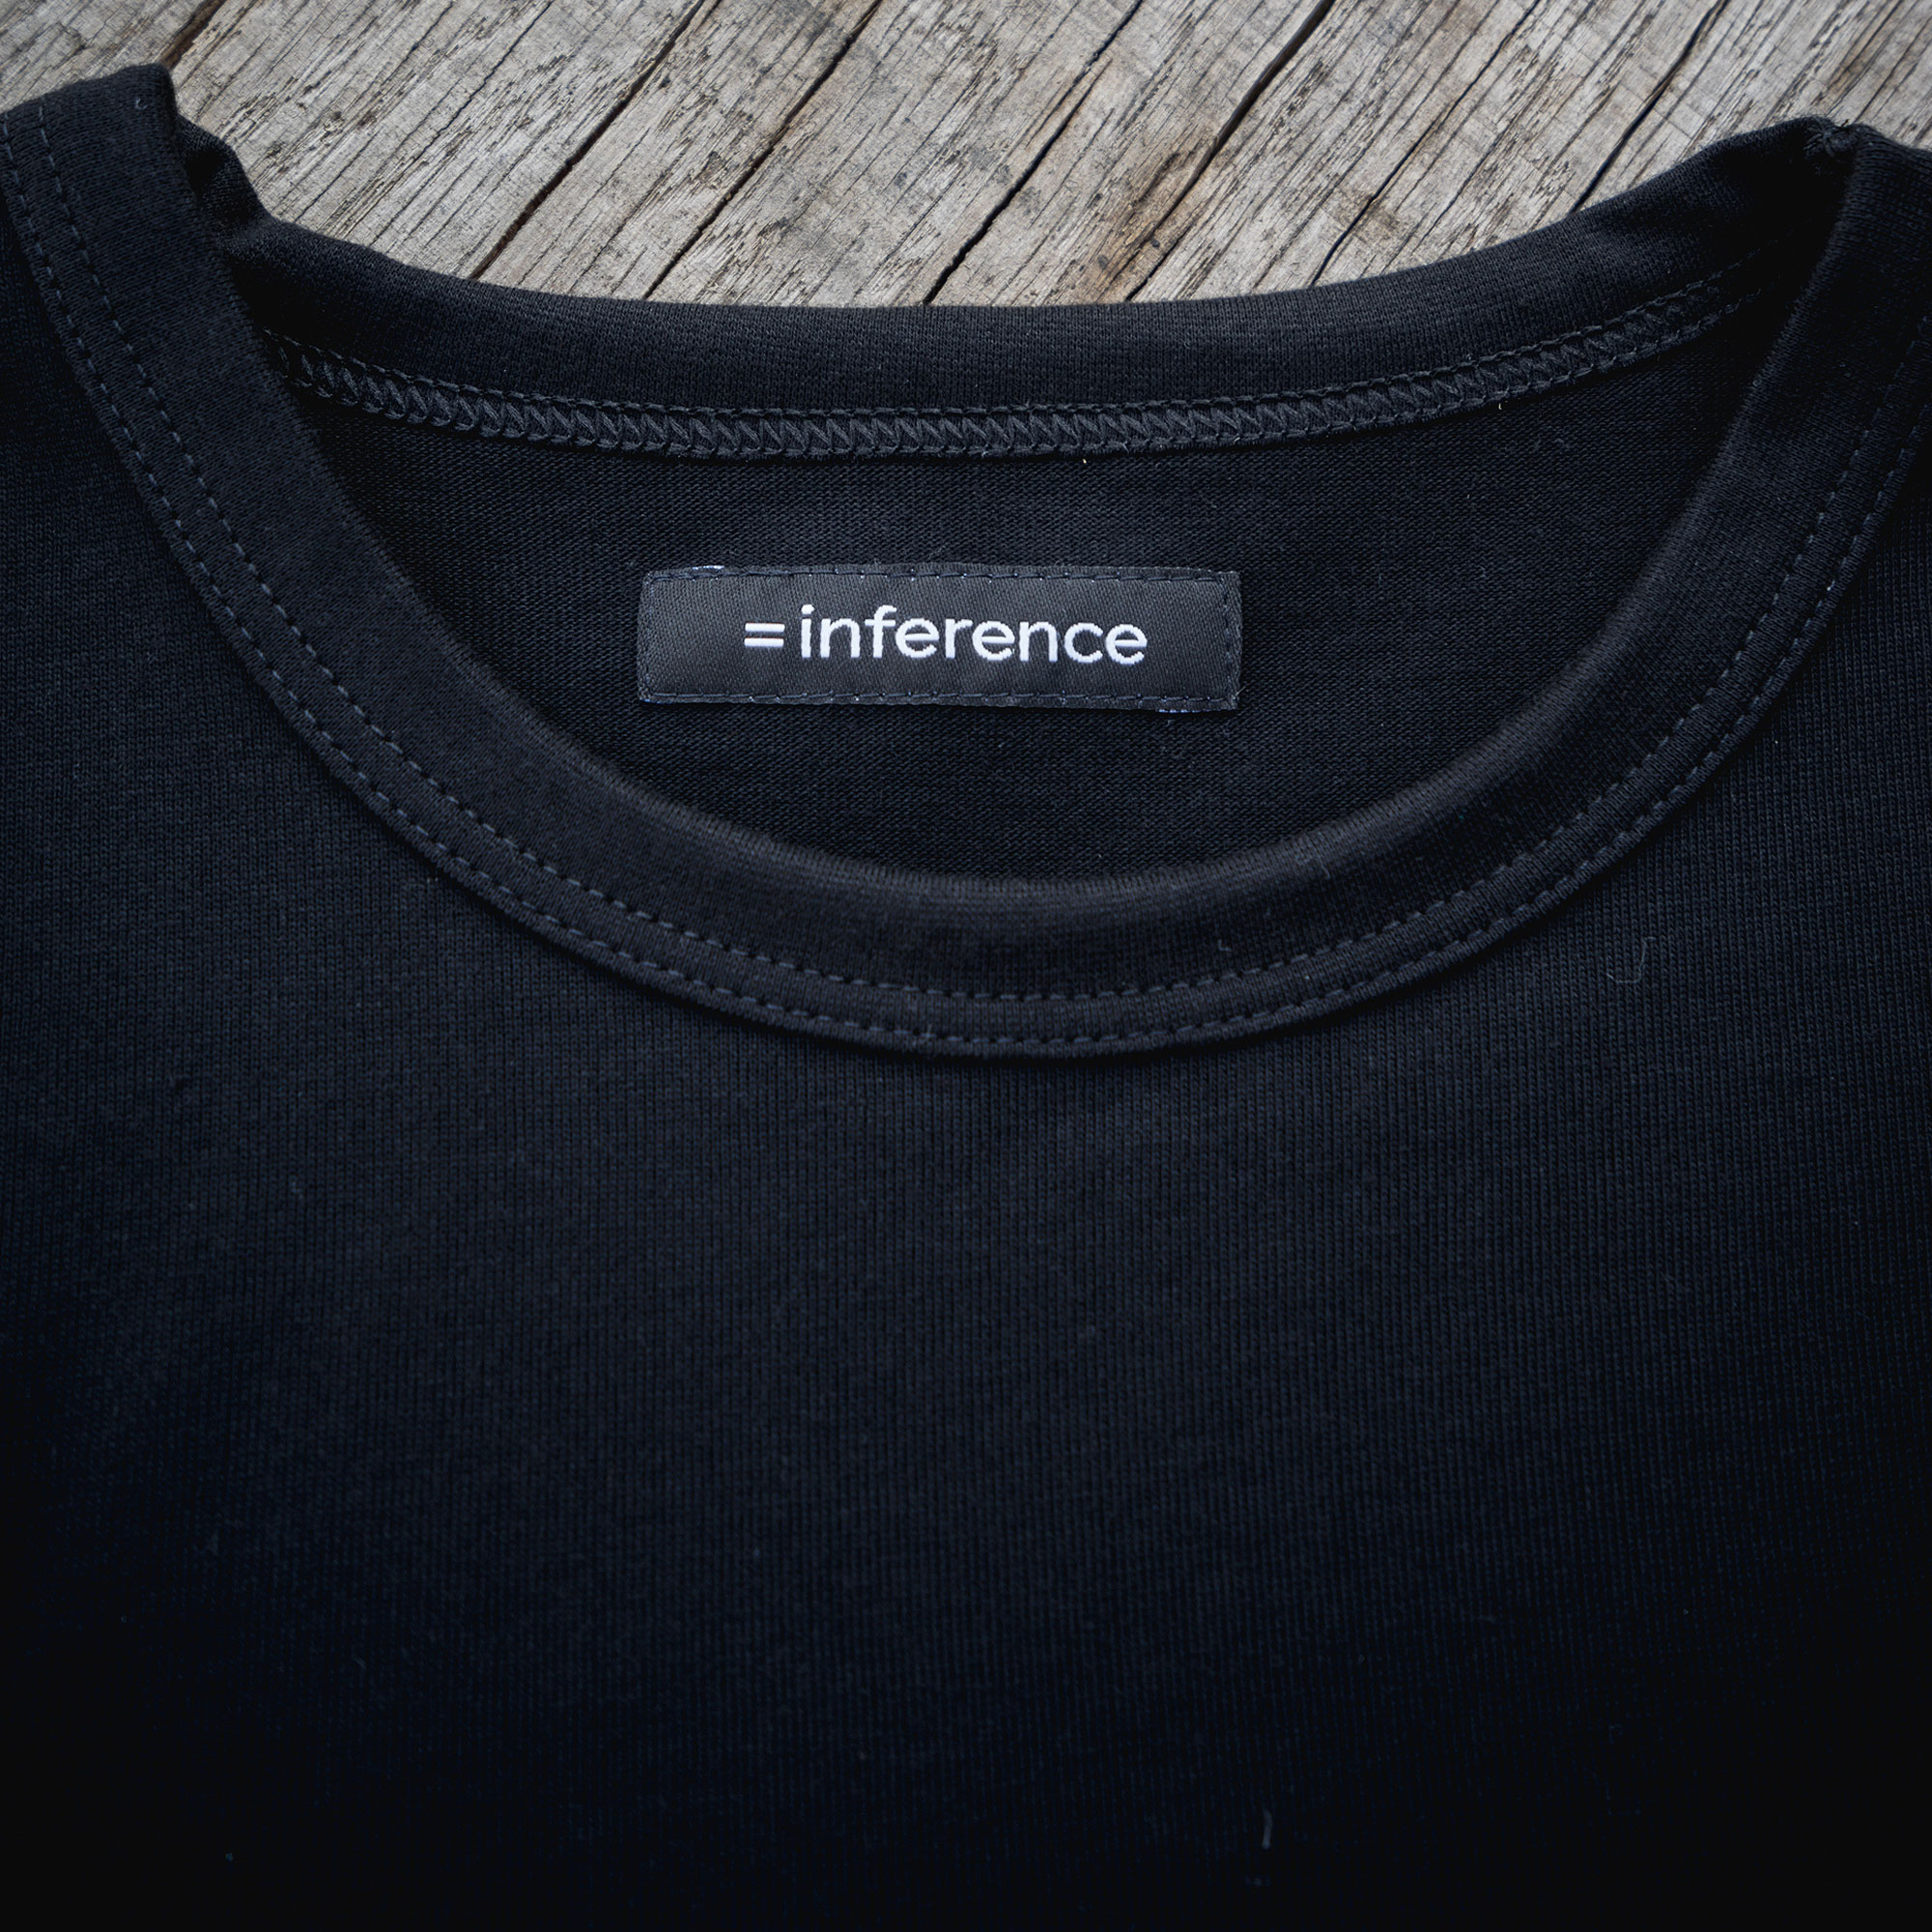 Inference_Pocket_007-1_004